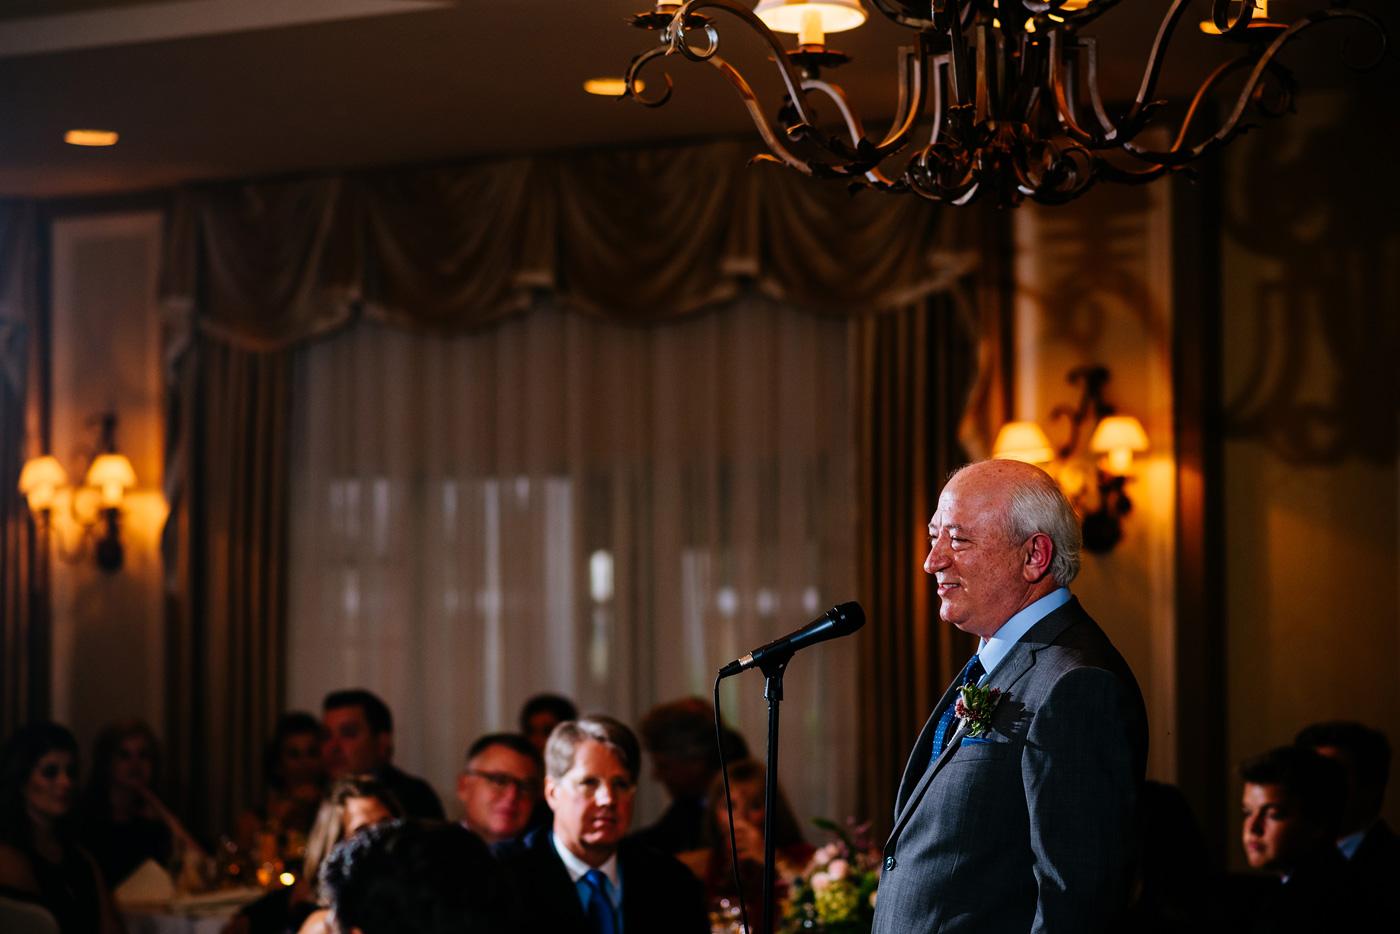 pittsburgh pa wedding toasts